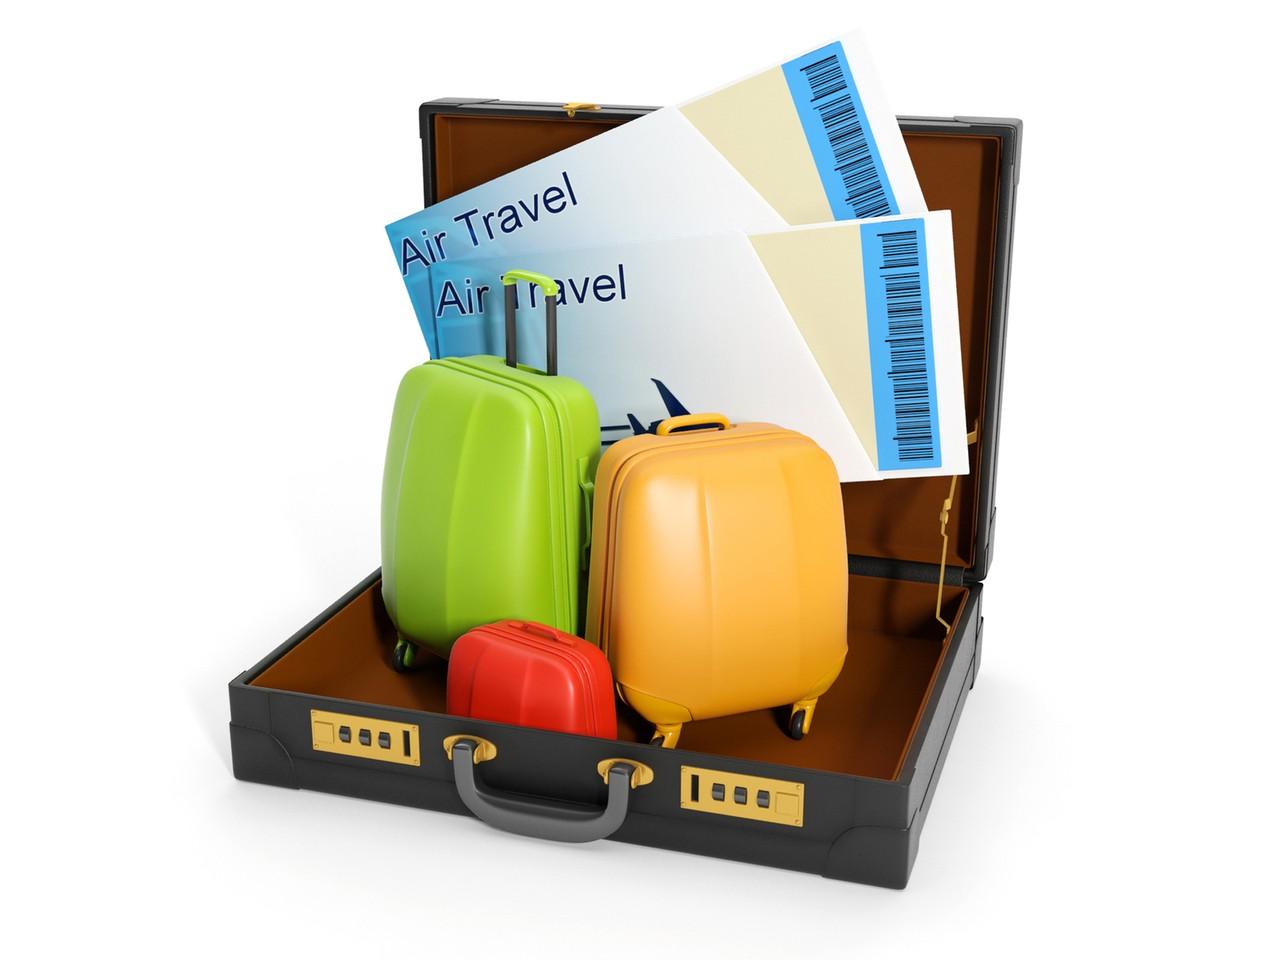 Co pakujemy na wakacyjny pobyt?